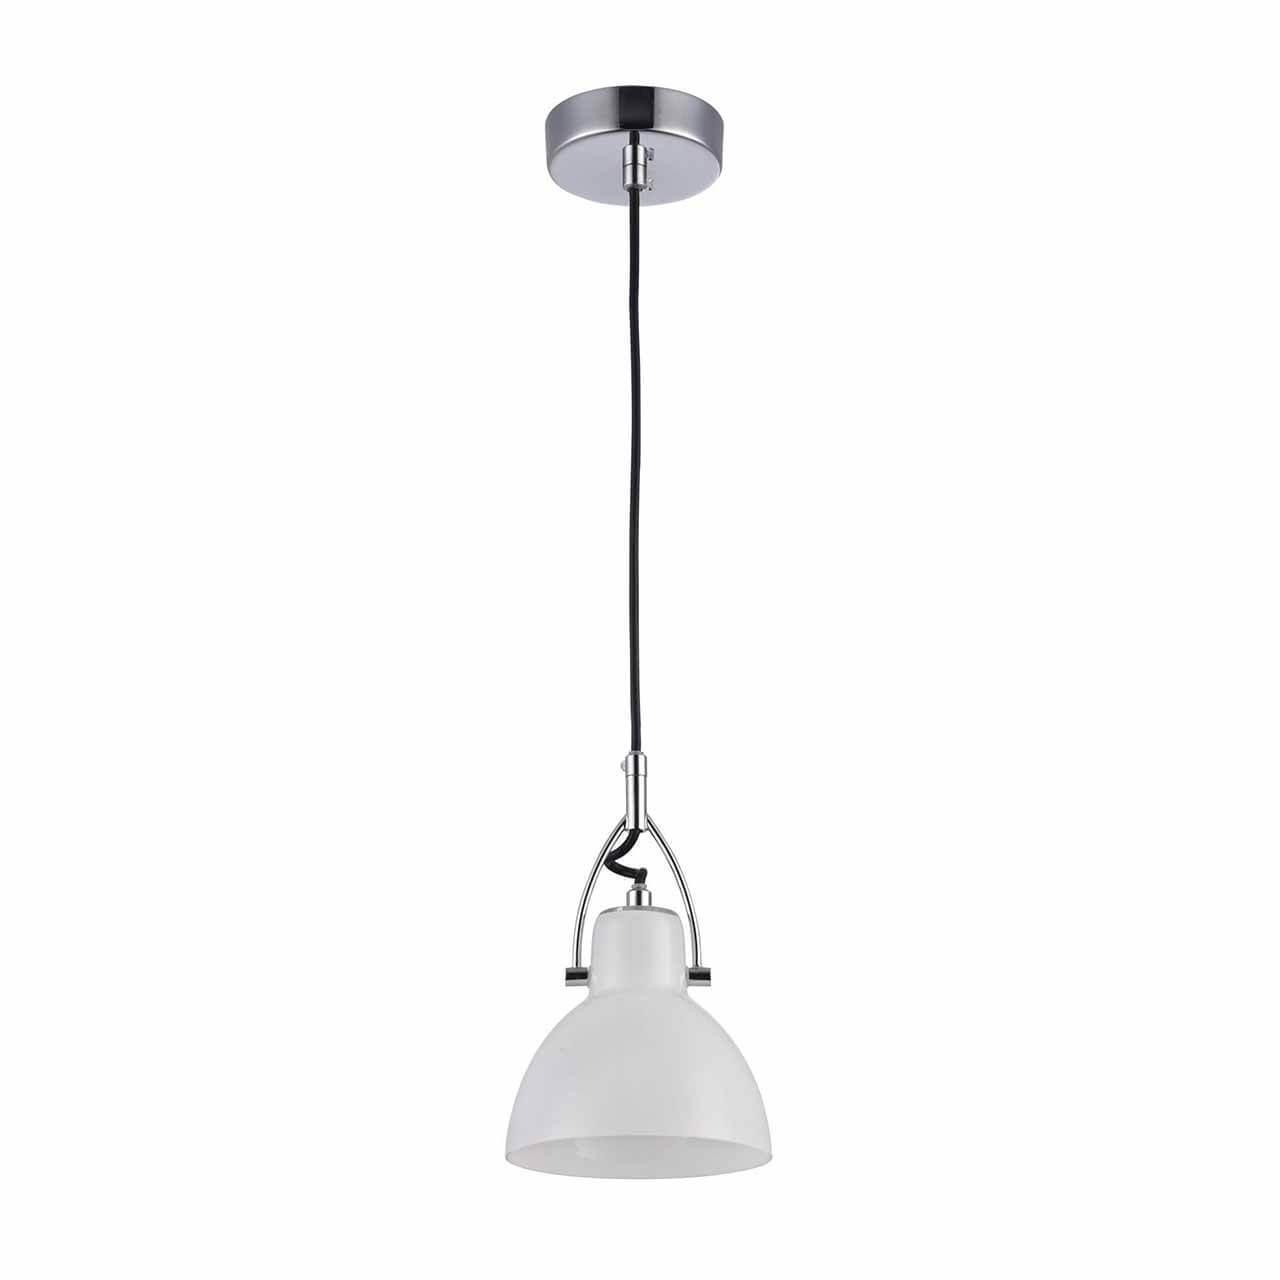 Подвесной светильник Maytoni MOD407-PL-01-N, E14, 40 Вт